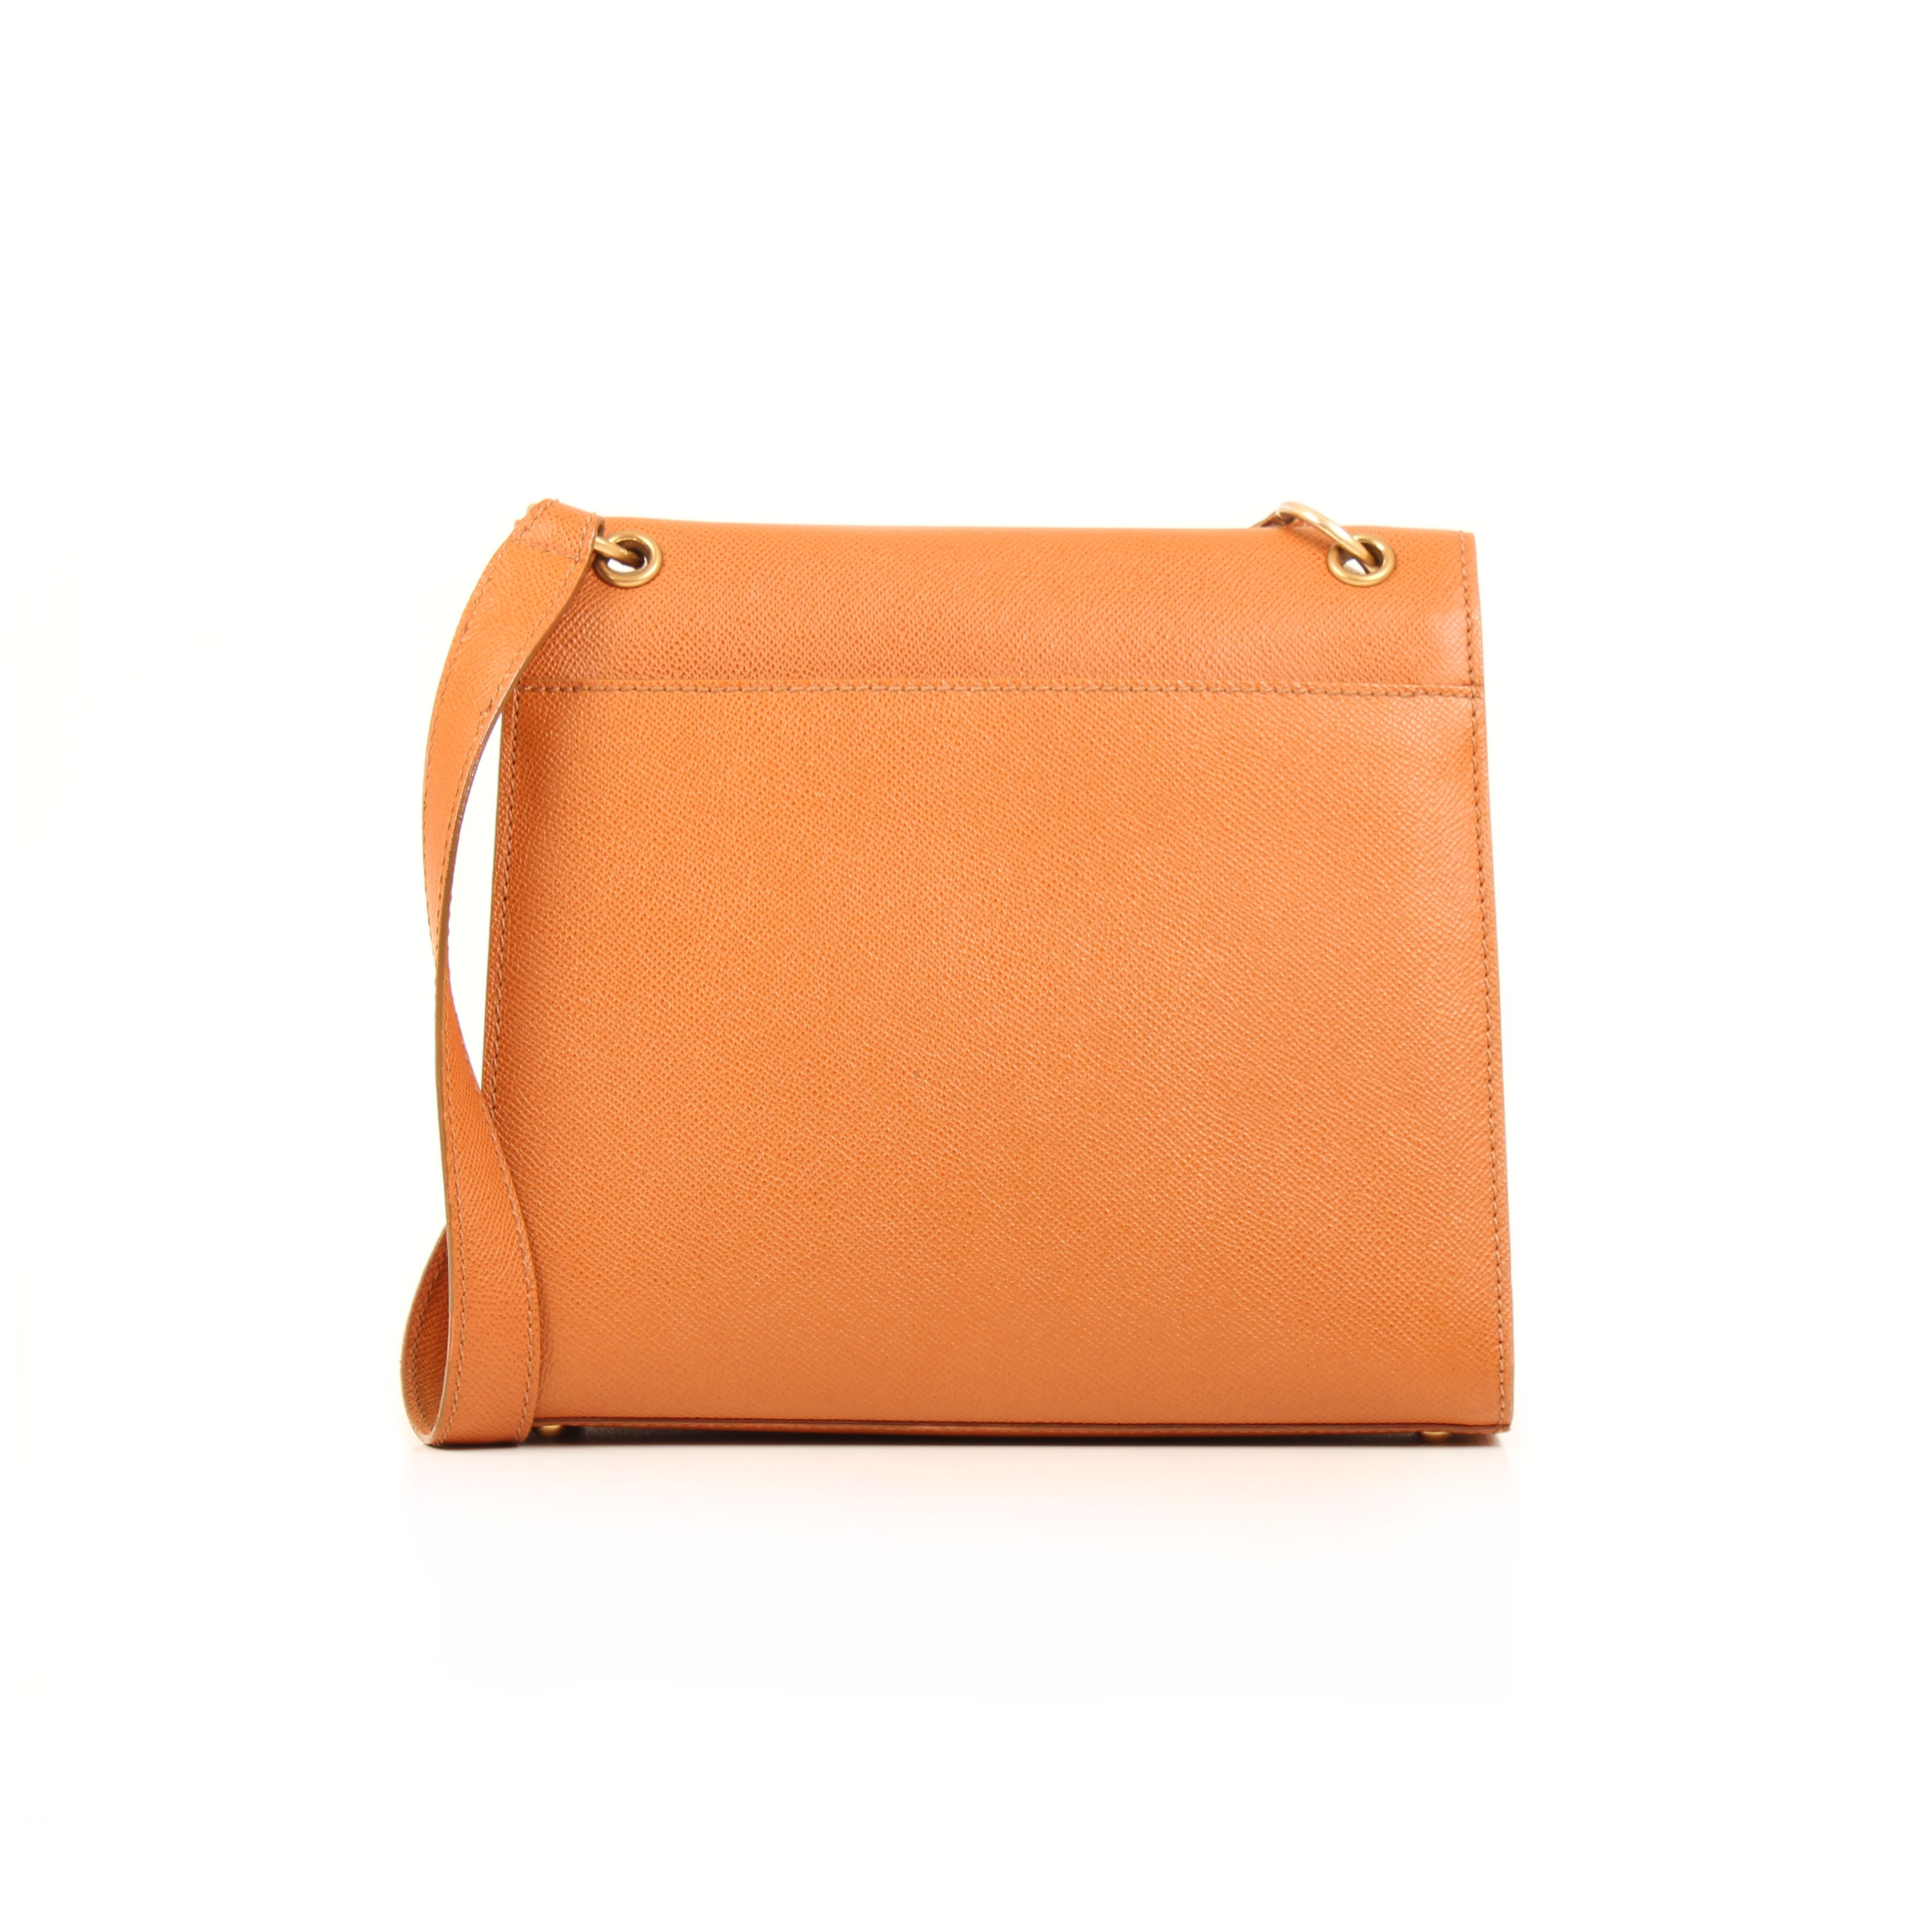 Imagen trasera del bolso chanel vintage piel granulada camel